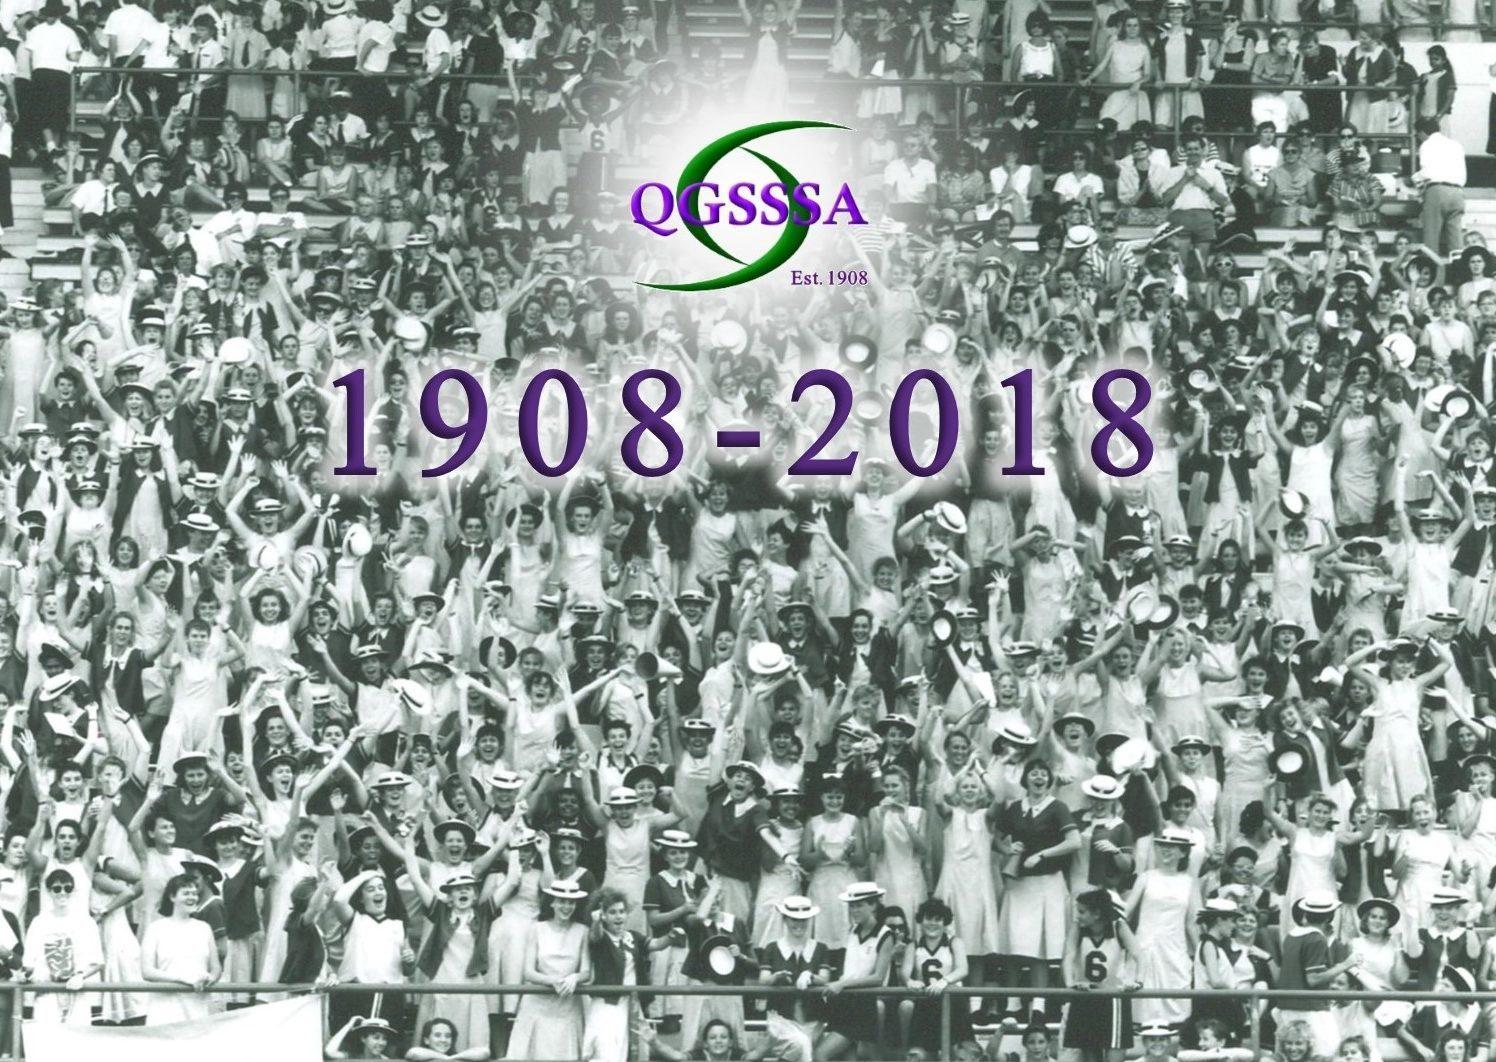 1908-2018: Celebrating 110 Years of Girls in Sport